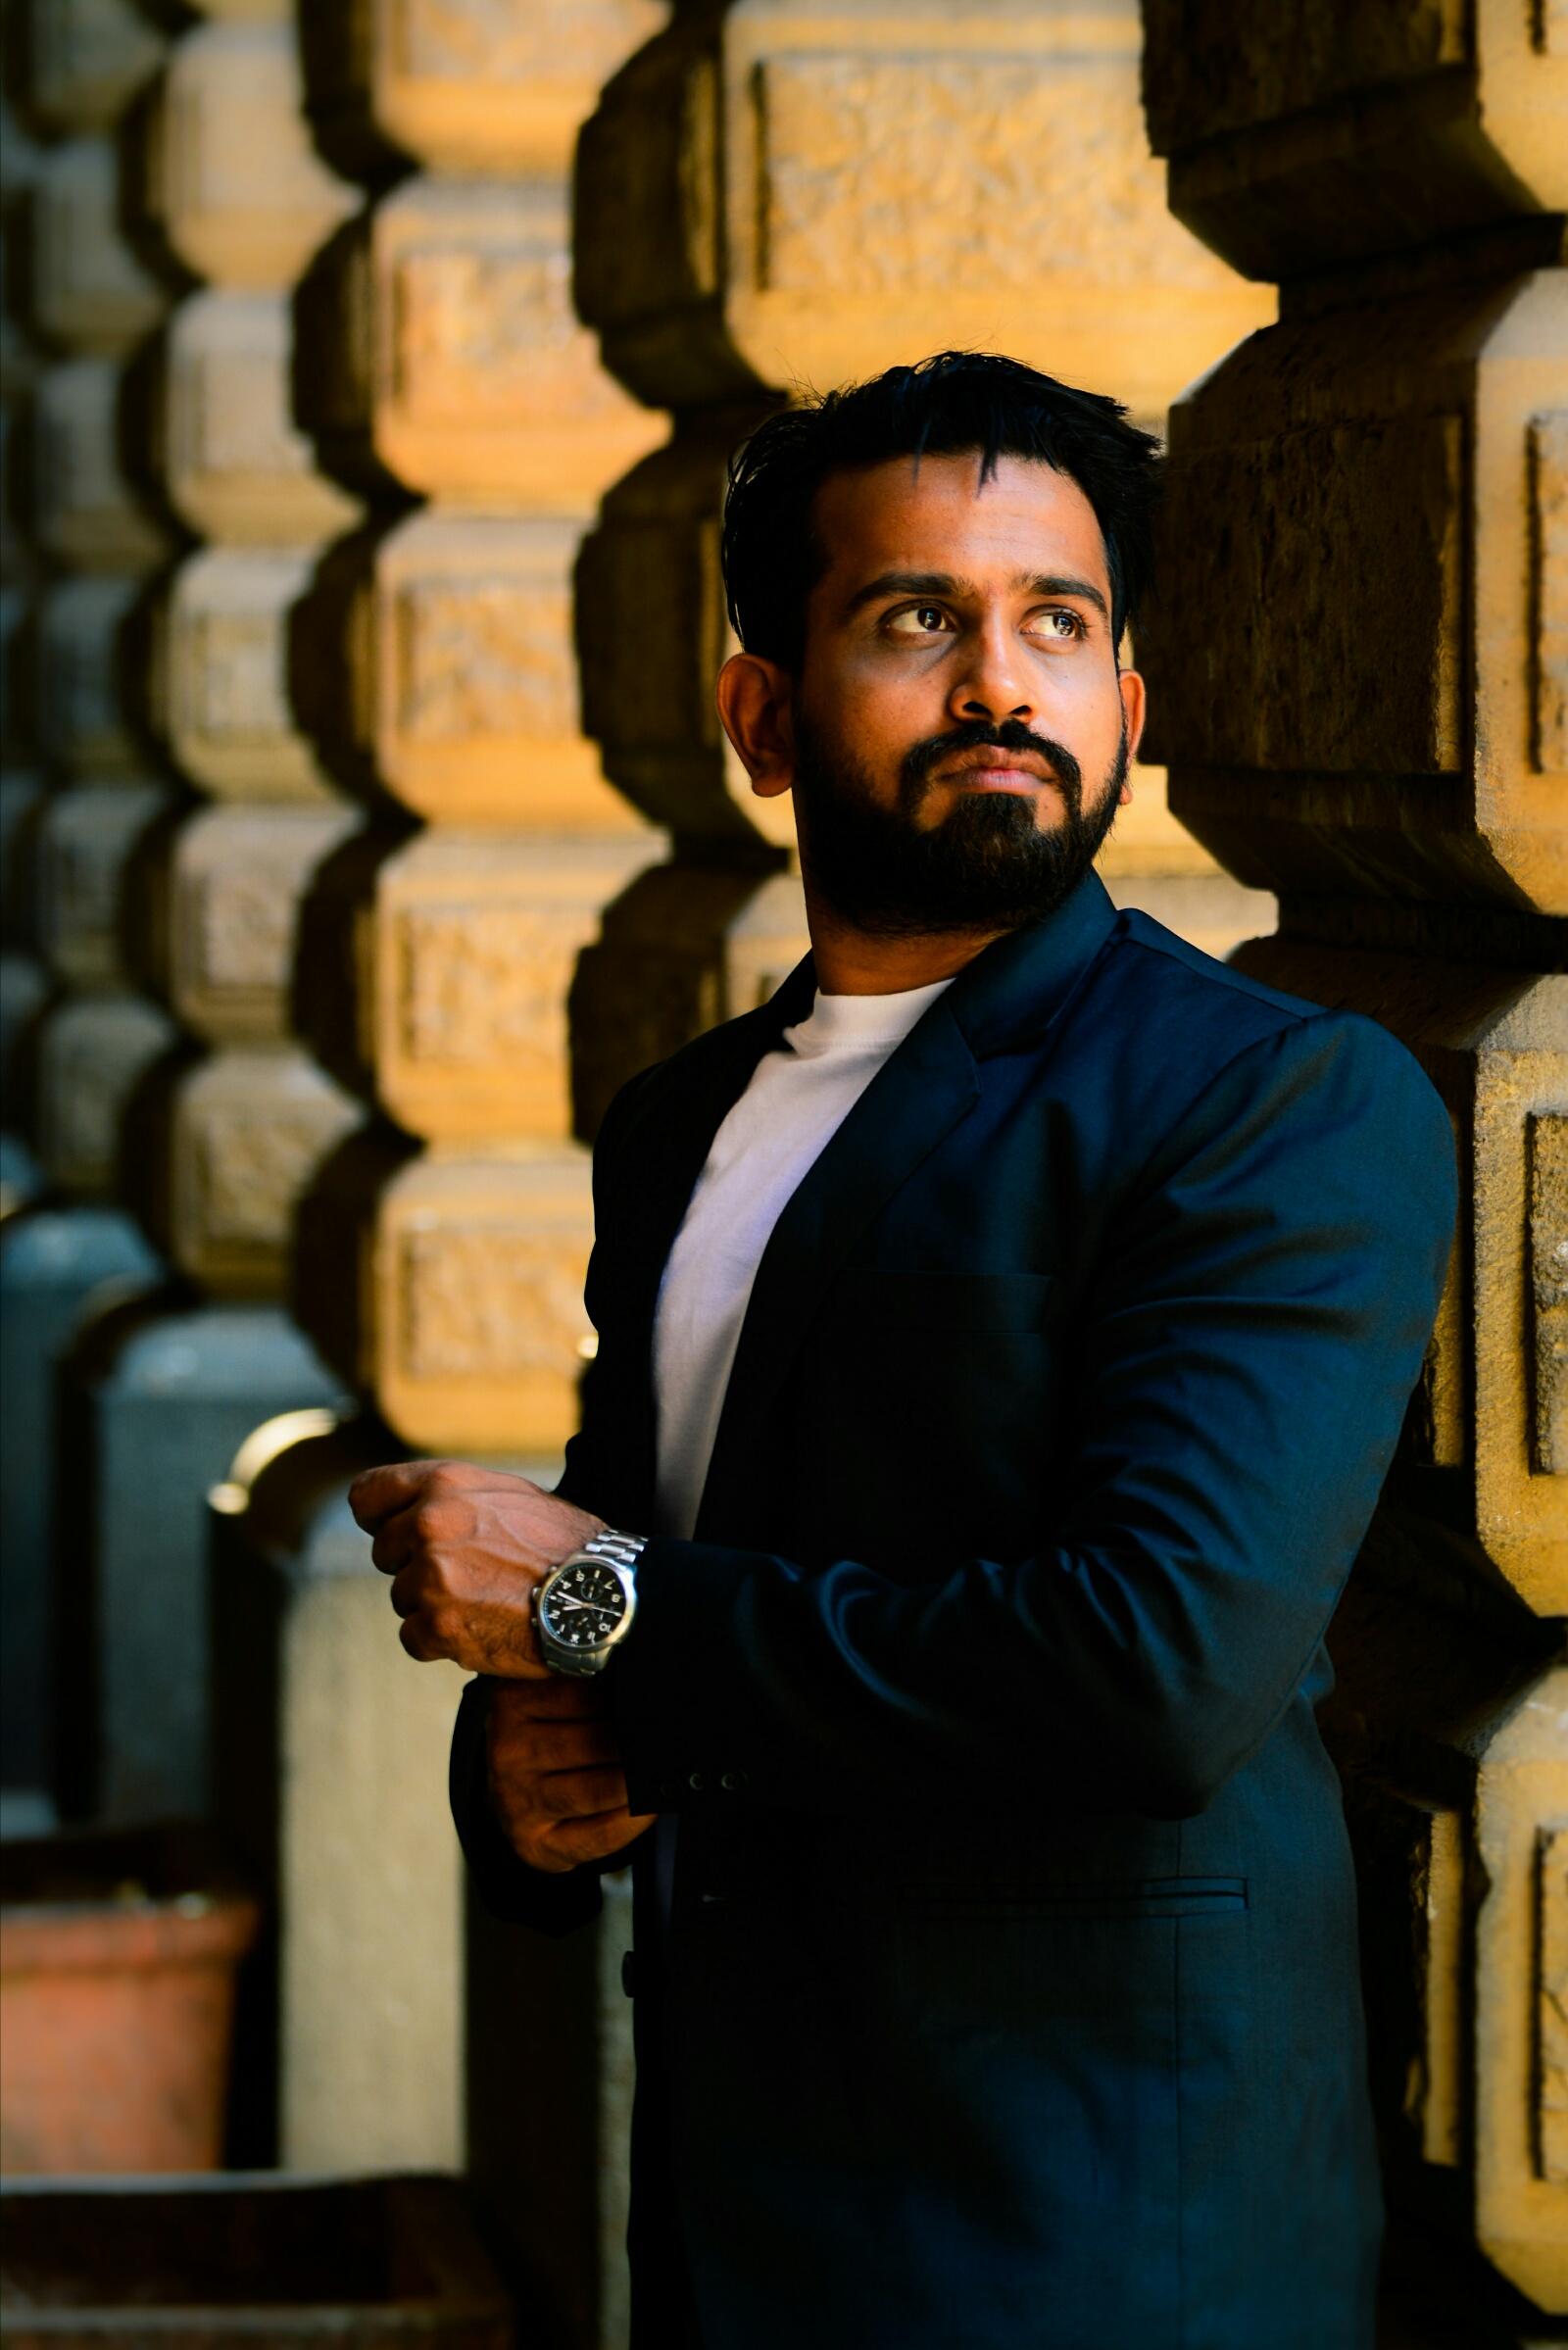 #blazer #men #mensfashion#beards #fashion#beard#fashionblogger#fashionblog #menofinstagram#fashionblogger #menstyle#fossil#fossilwatch#raymond#fashionblogger_de #portrait#portraits#suitedup #suitedman#fashionblogs#formals#menofinstagram#menstagram  #mens #formalwear #alldressedup #fashionmen #photooftheday  #gentlemanmood  #gentleman#india#mumbai